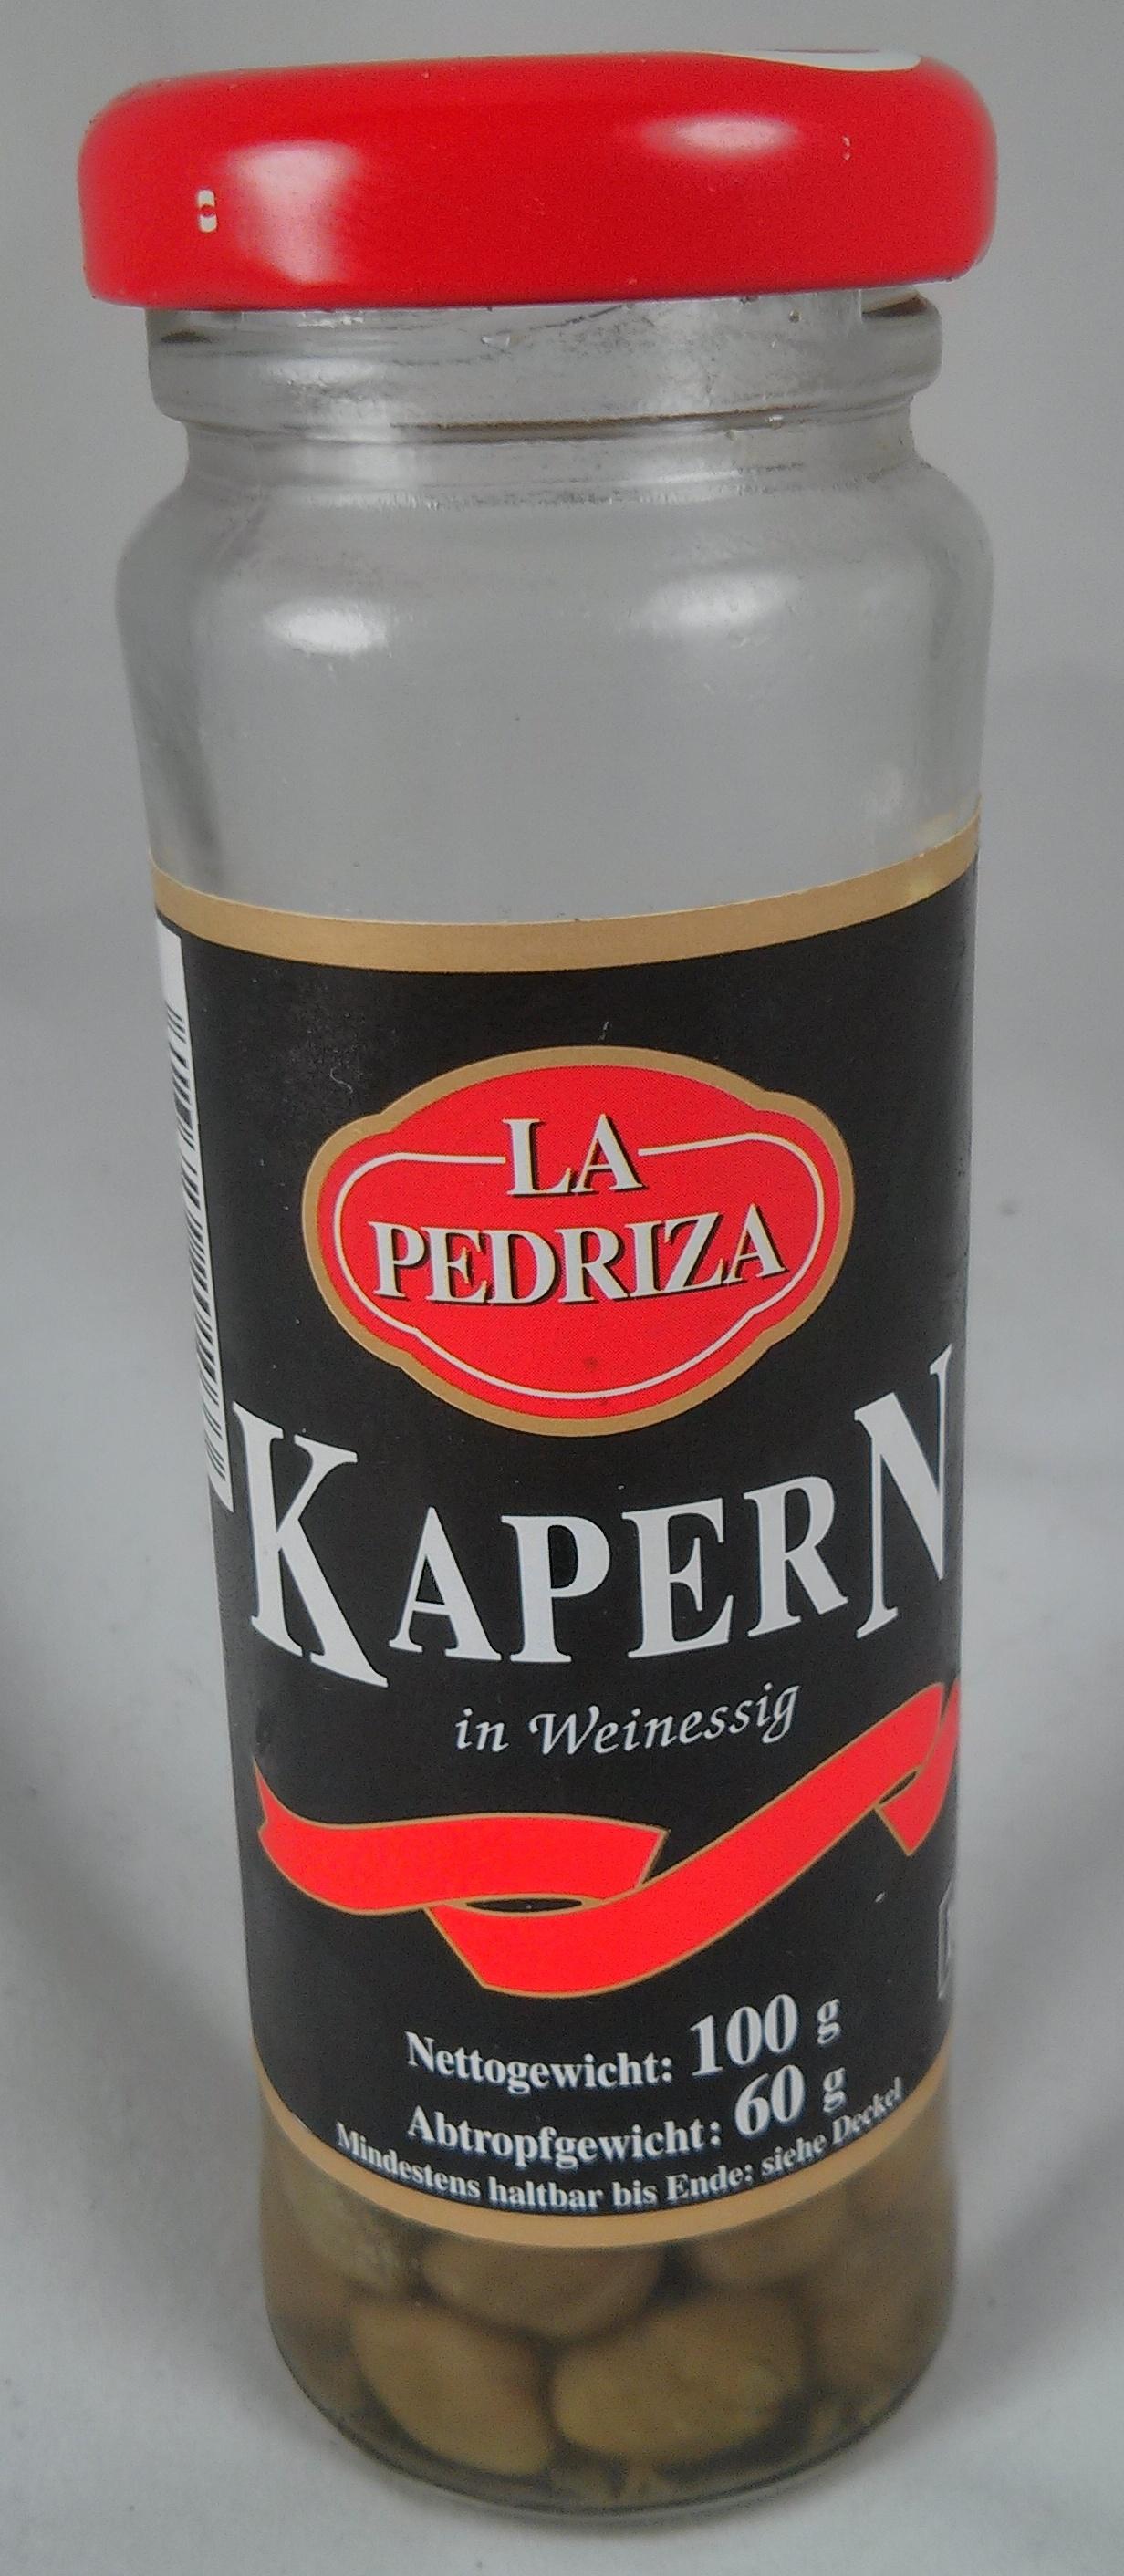 Kapern in Weinessig - Product - de